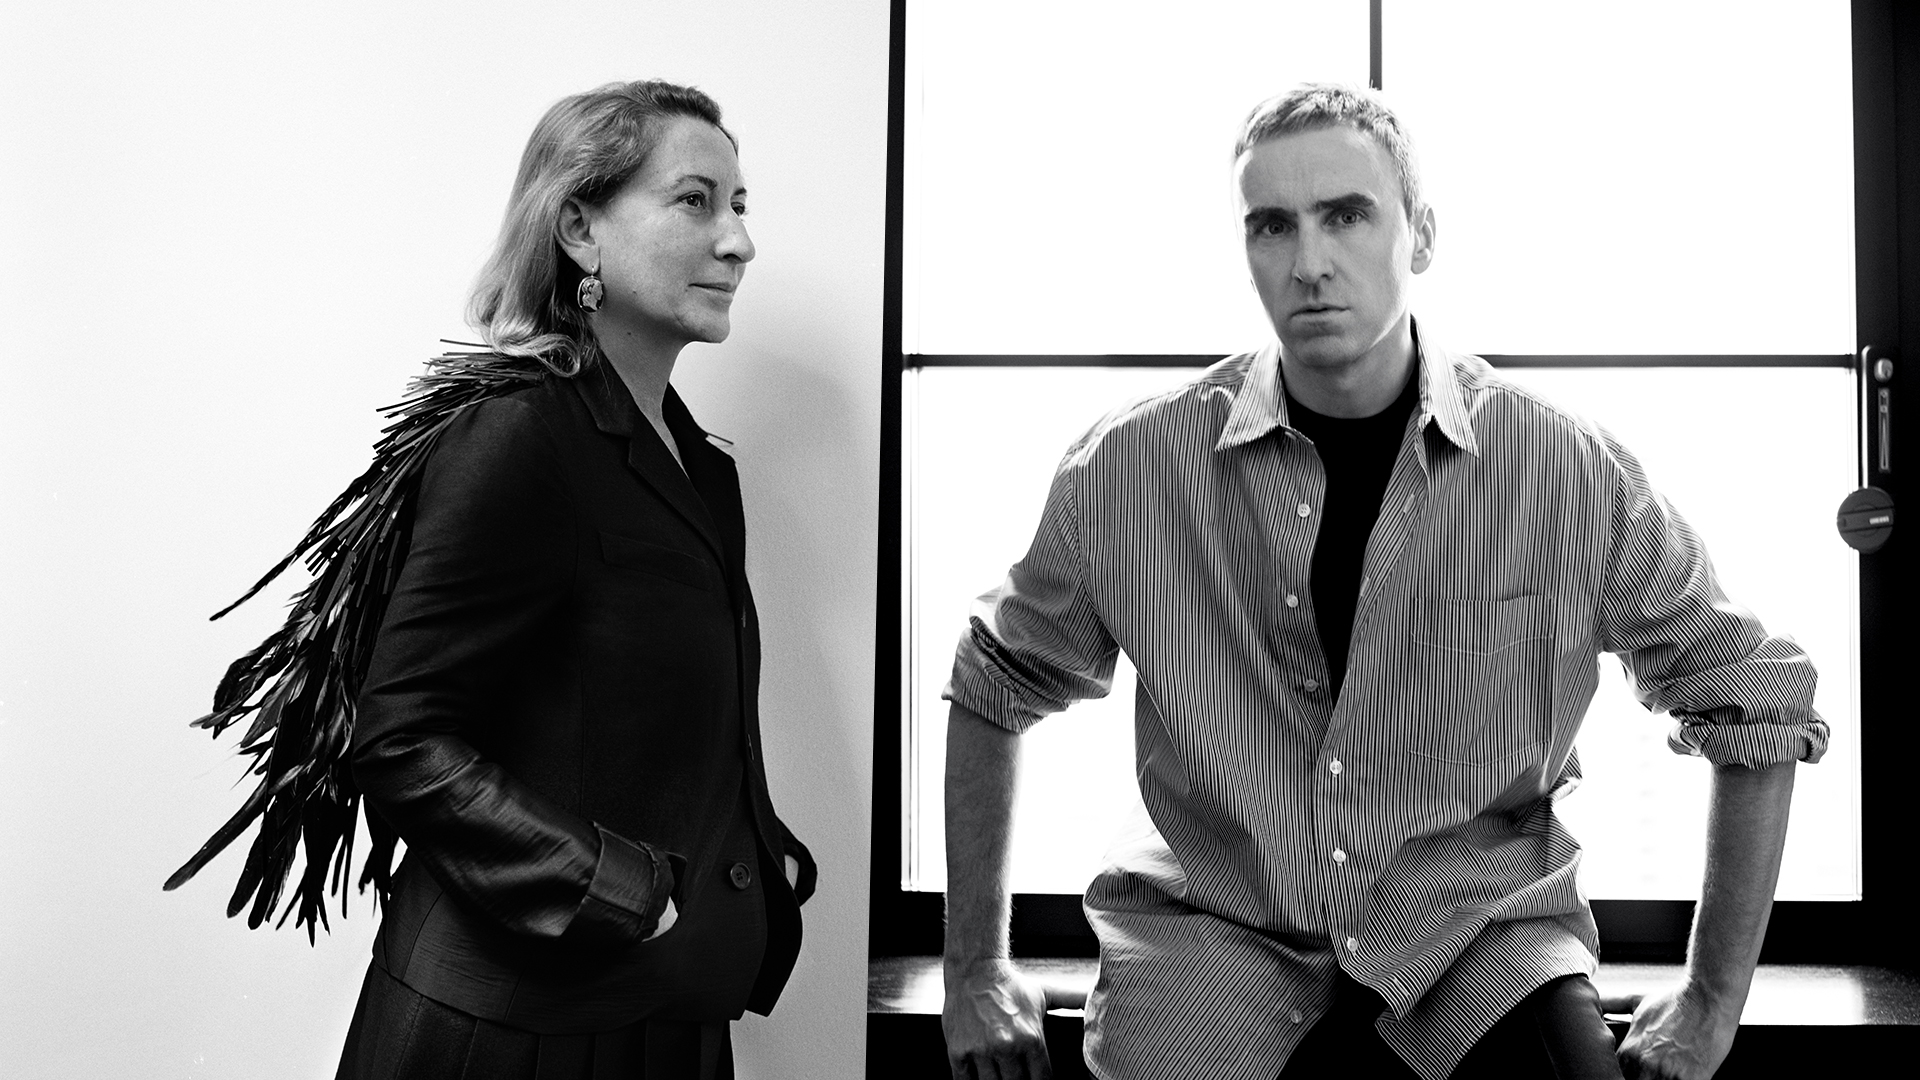 Miuccia Prada and Raf Simons are now co-creative directors of Prada.